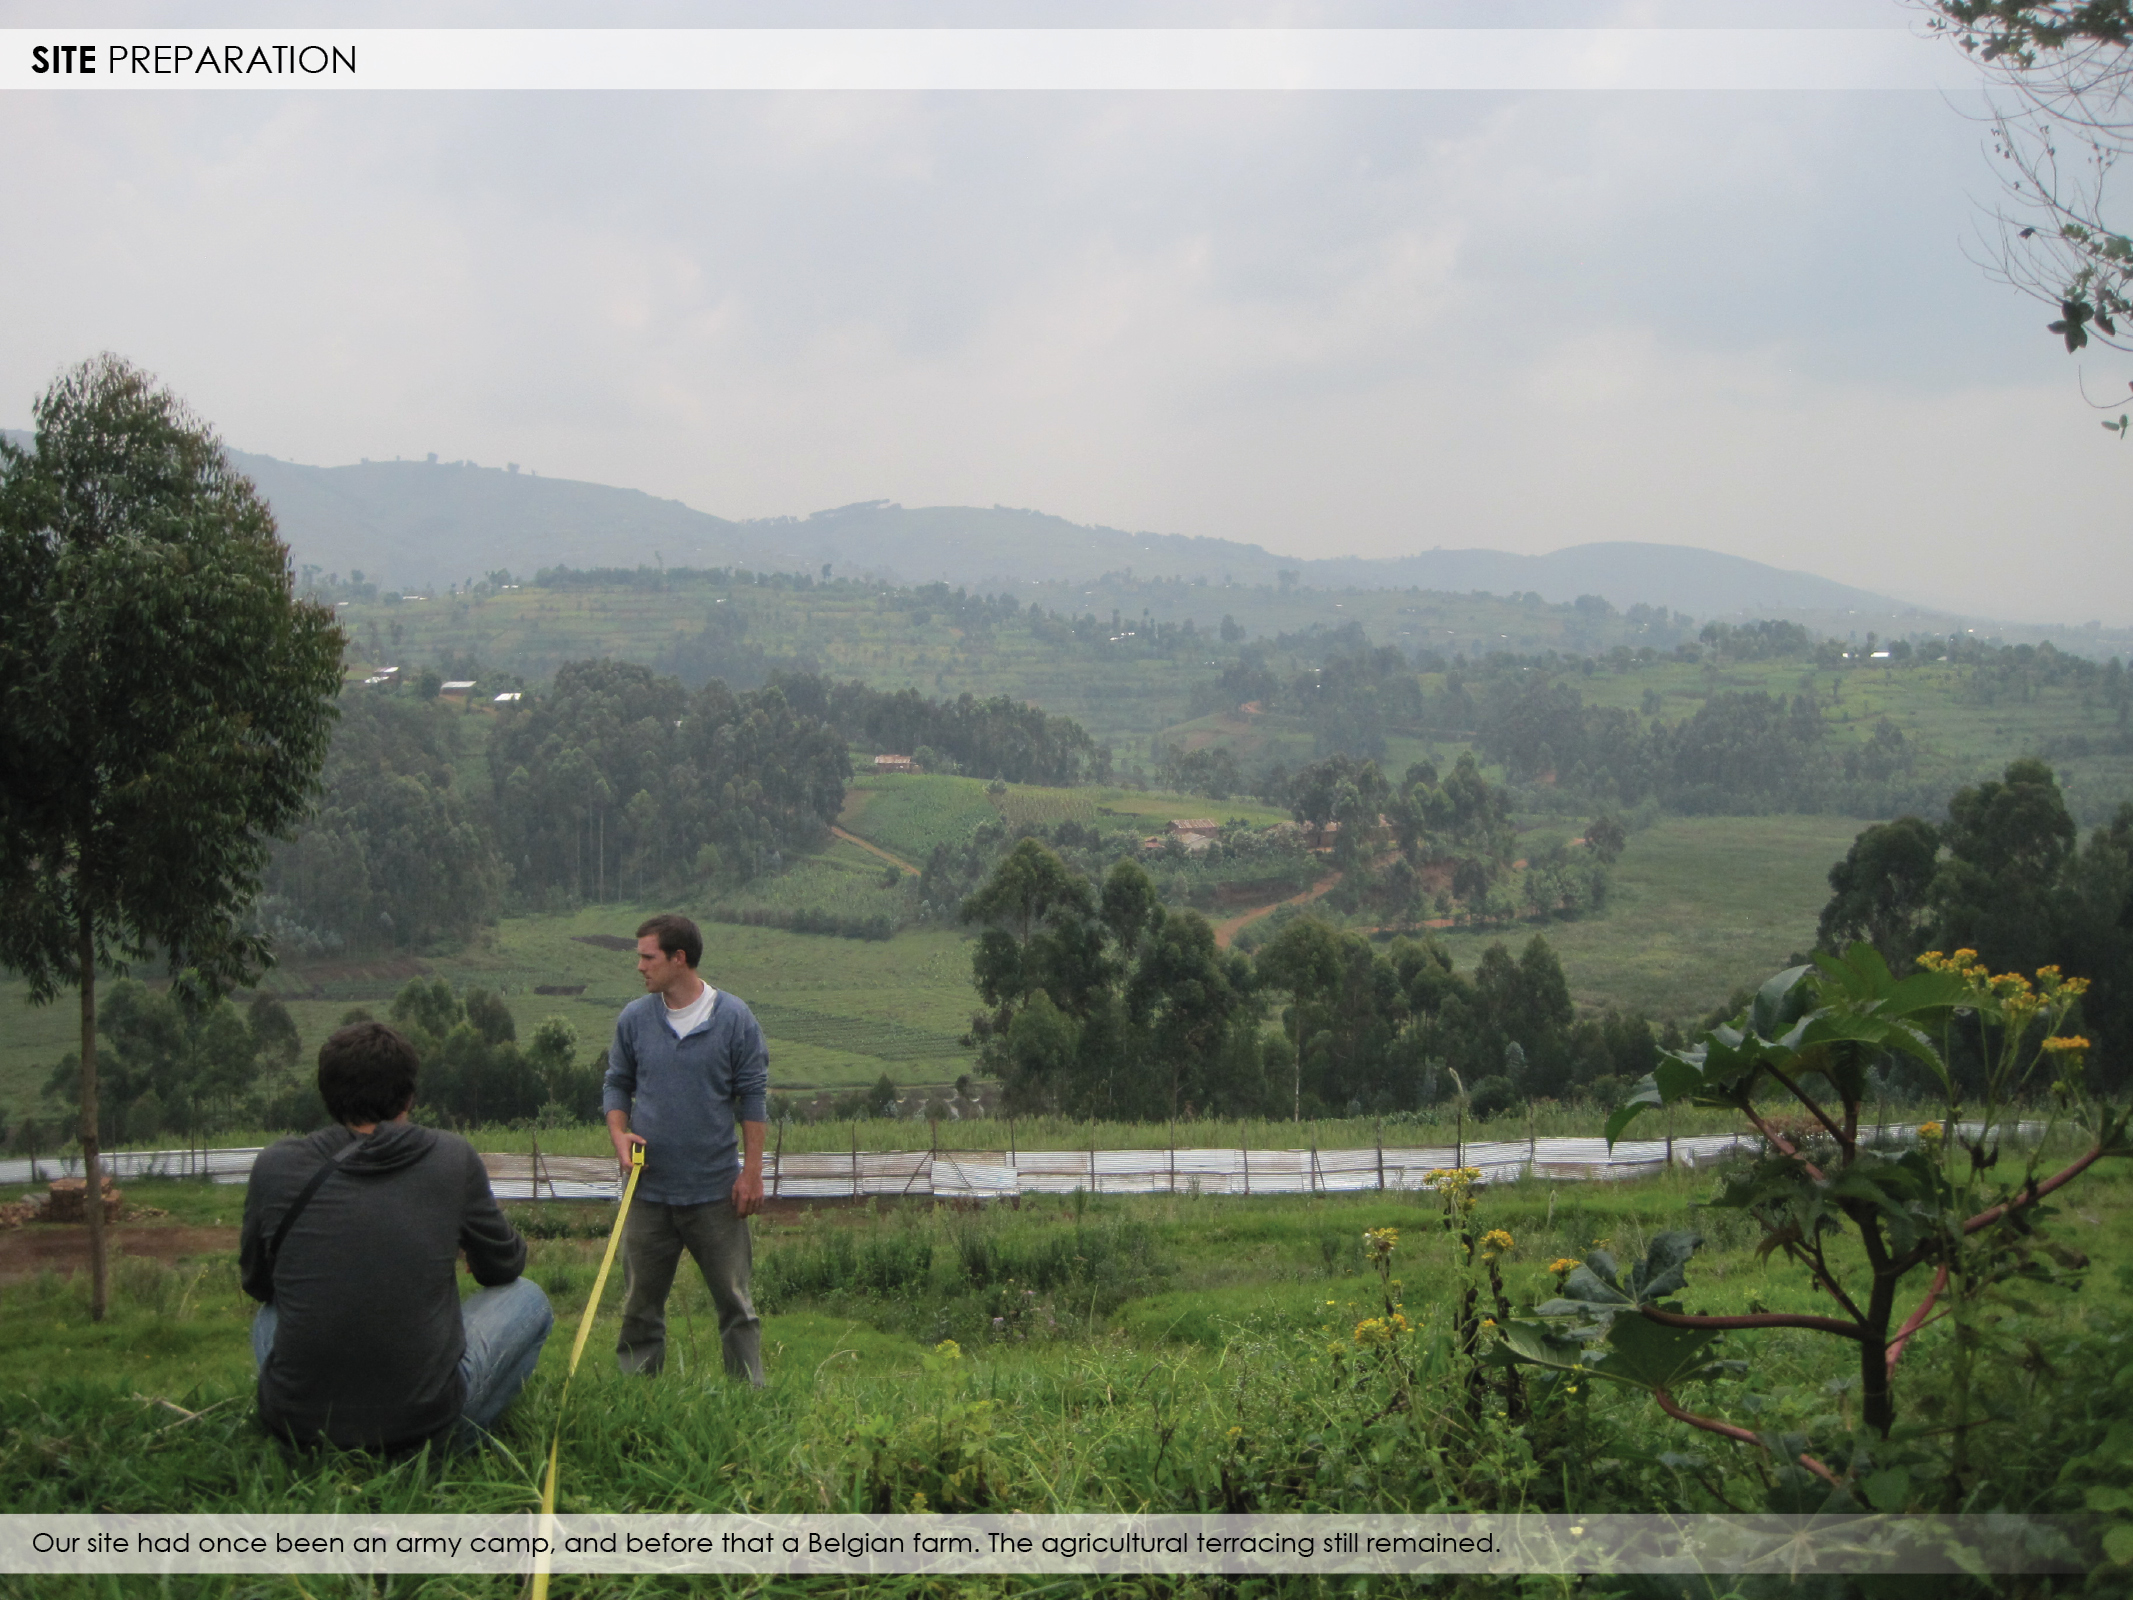 Gaugler_RwandaExperience_p5.jpg